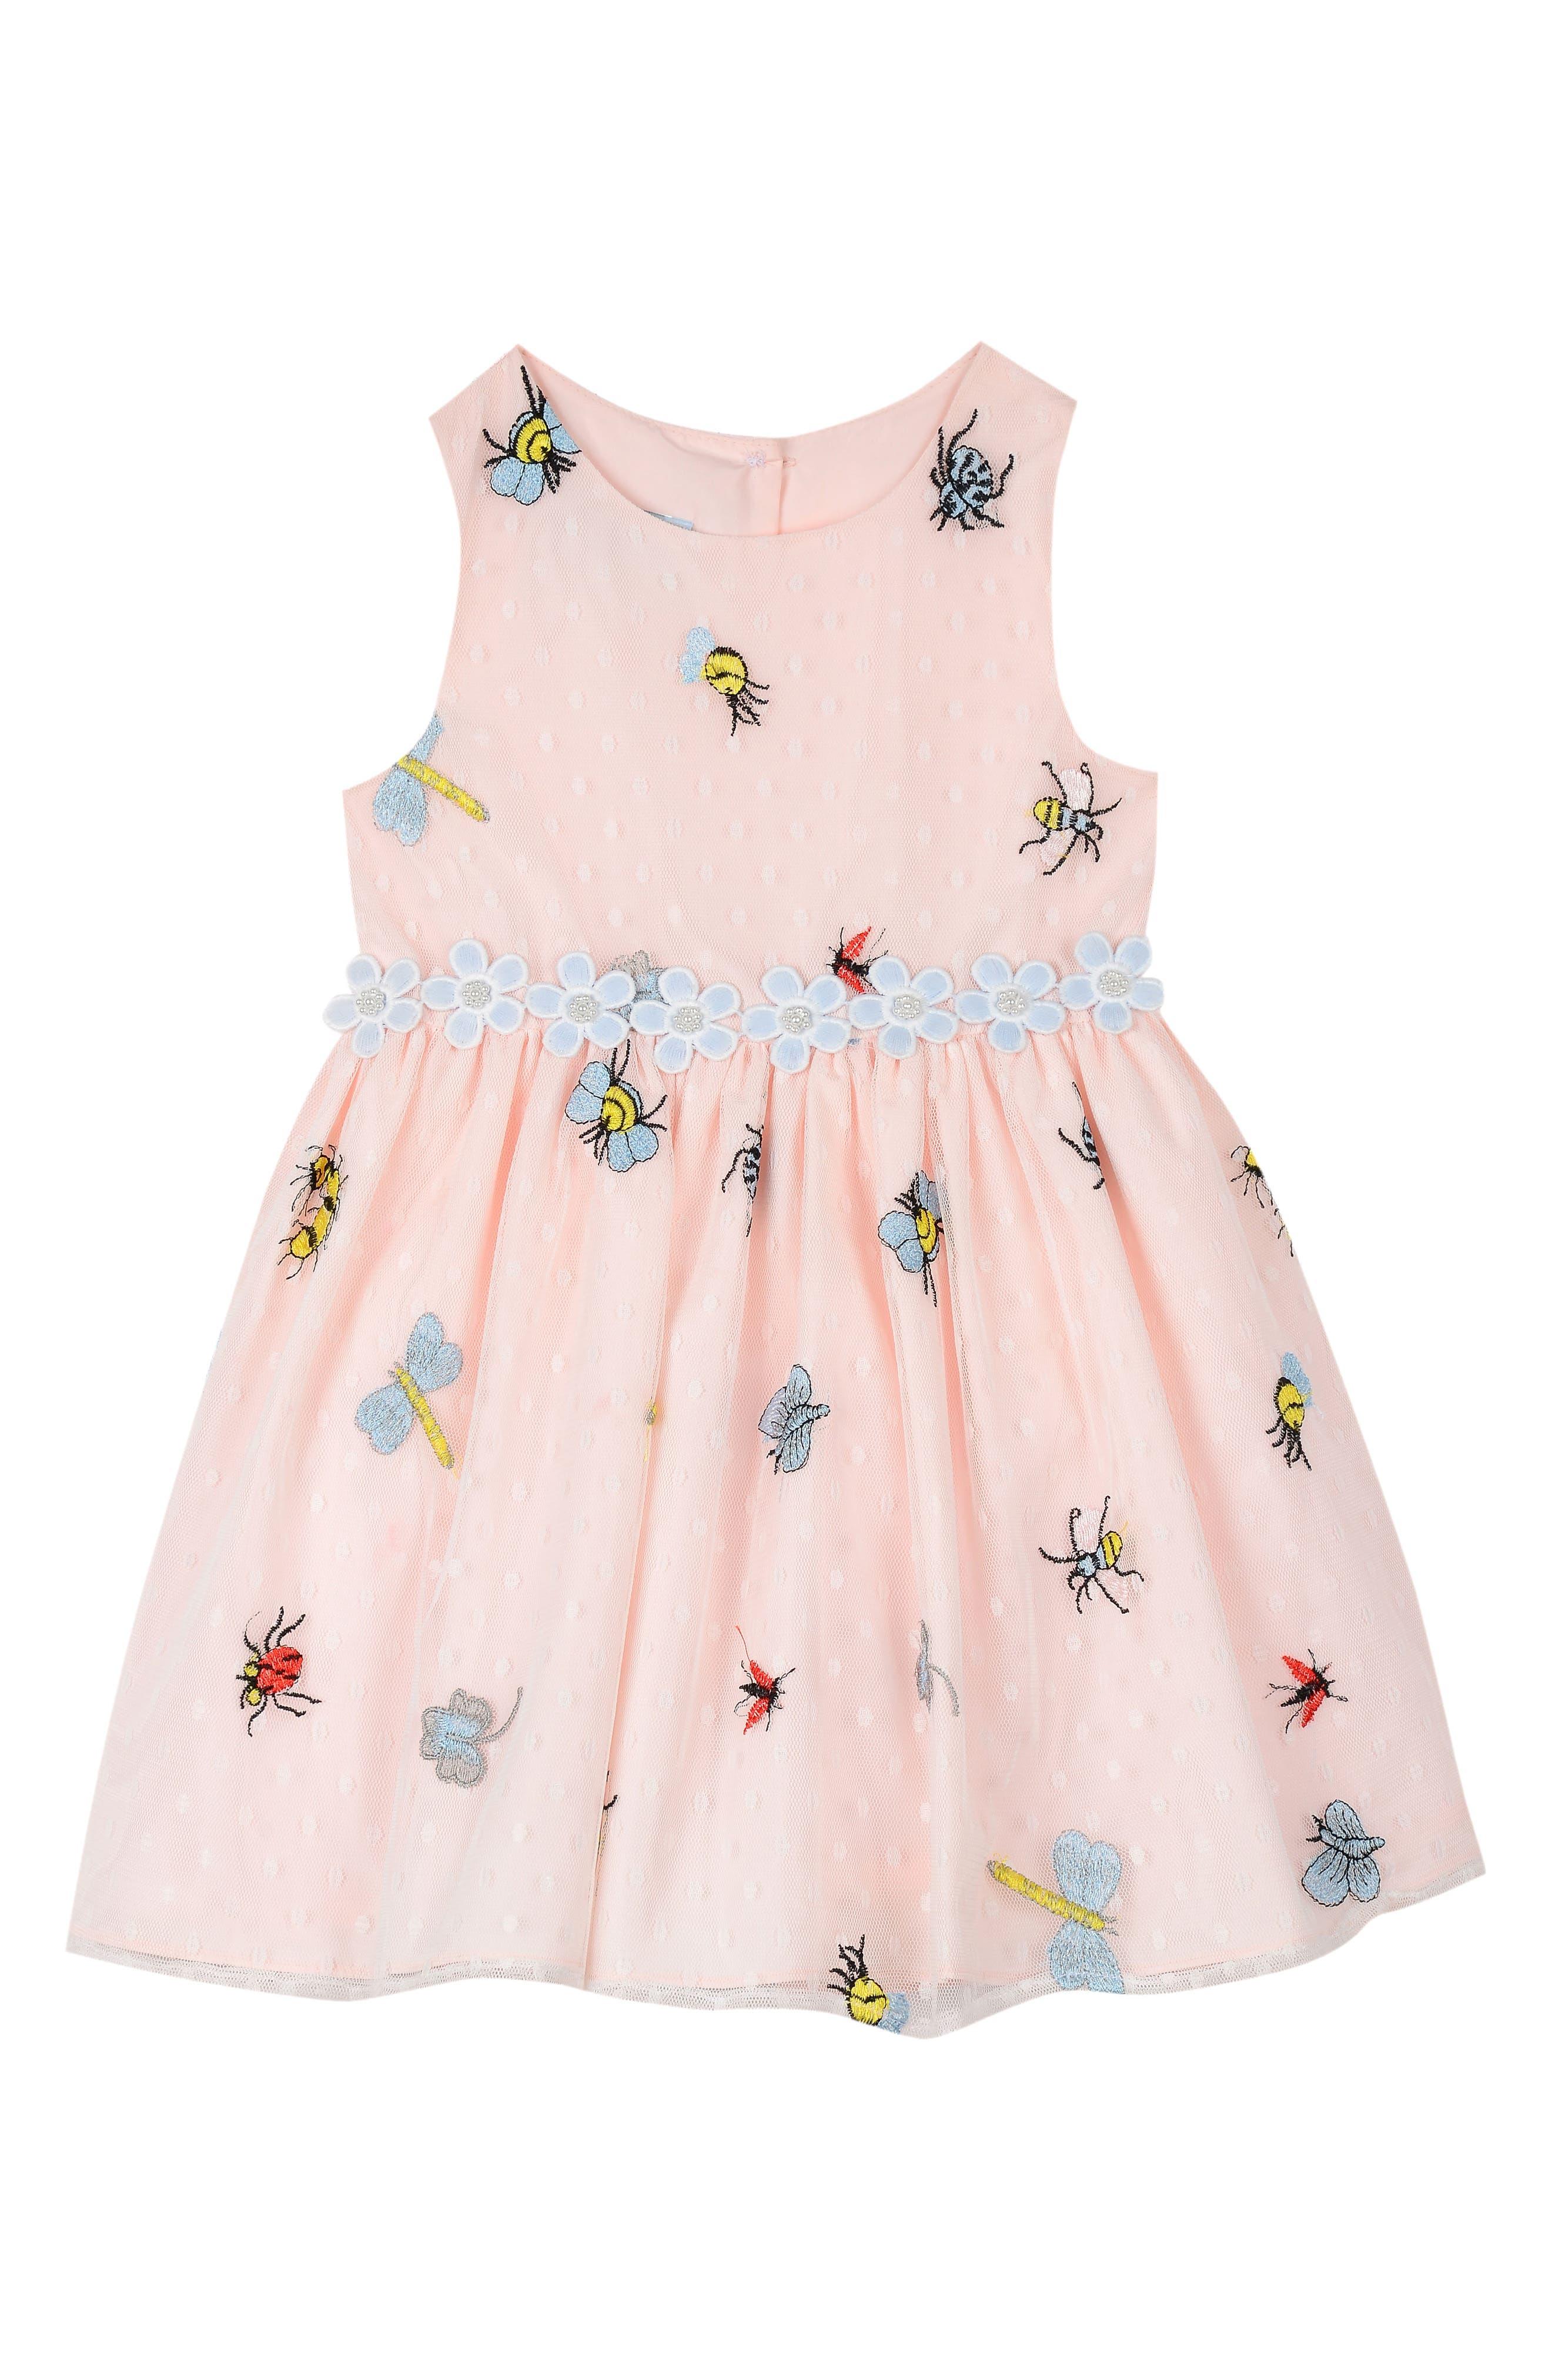 Main Image - Pippa & Julie Embroidered Mesh Fit & Flare Dress (Toddler Girls, Little Girls & Big Girls)